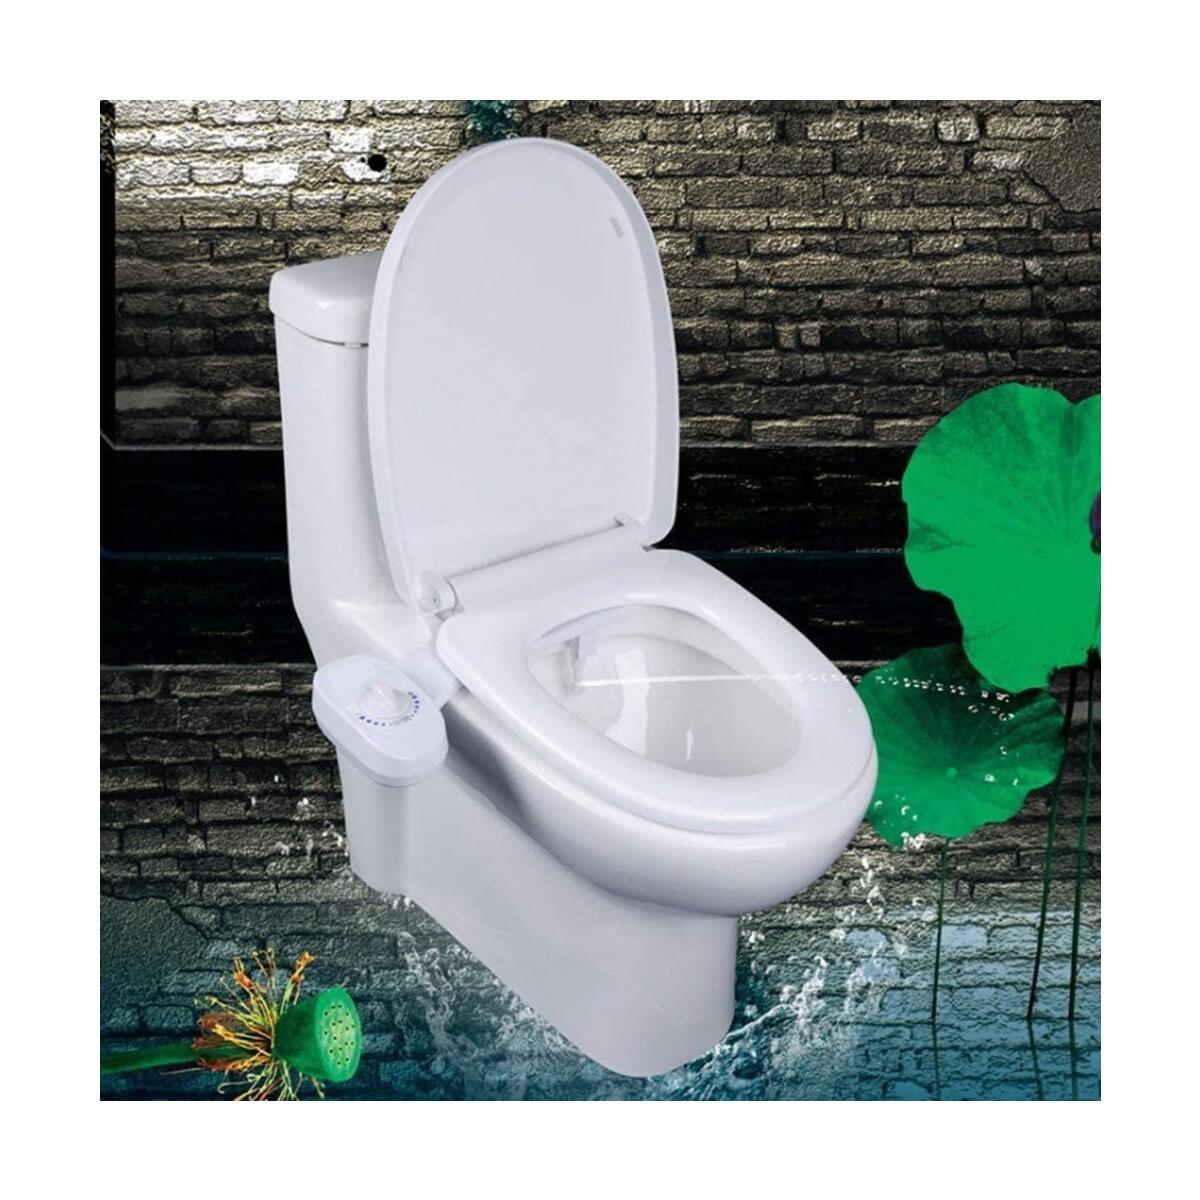 ROHSCE Self Cleaning Nozzle Fresh Water Non-Electric Bidet Cold Water Bidet, Nozzle Portable Bidet Attachment, White